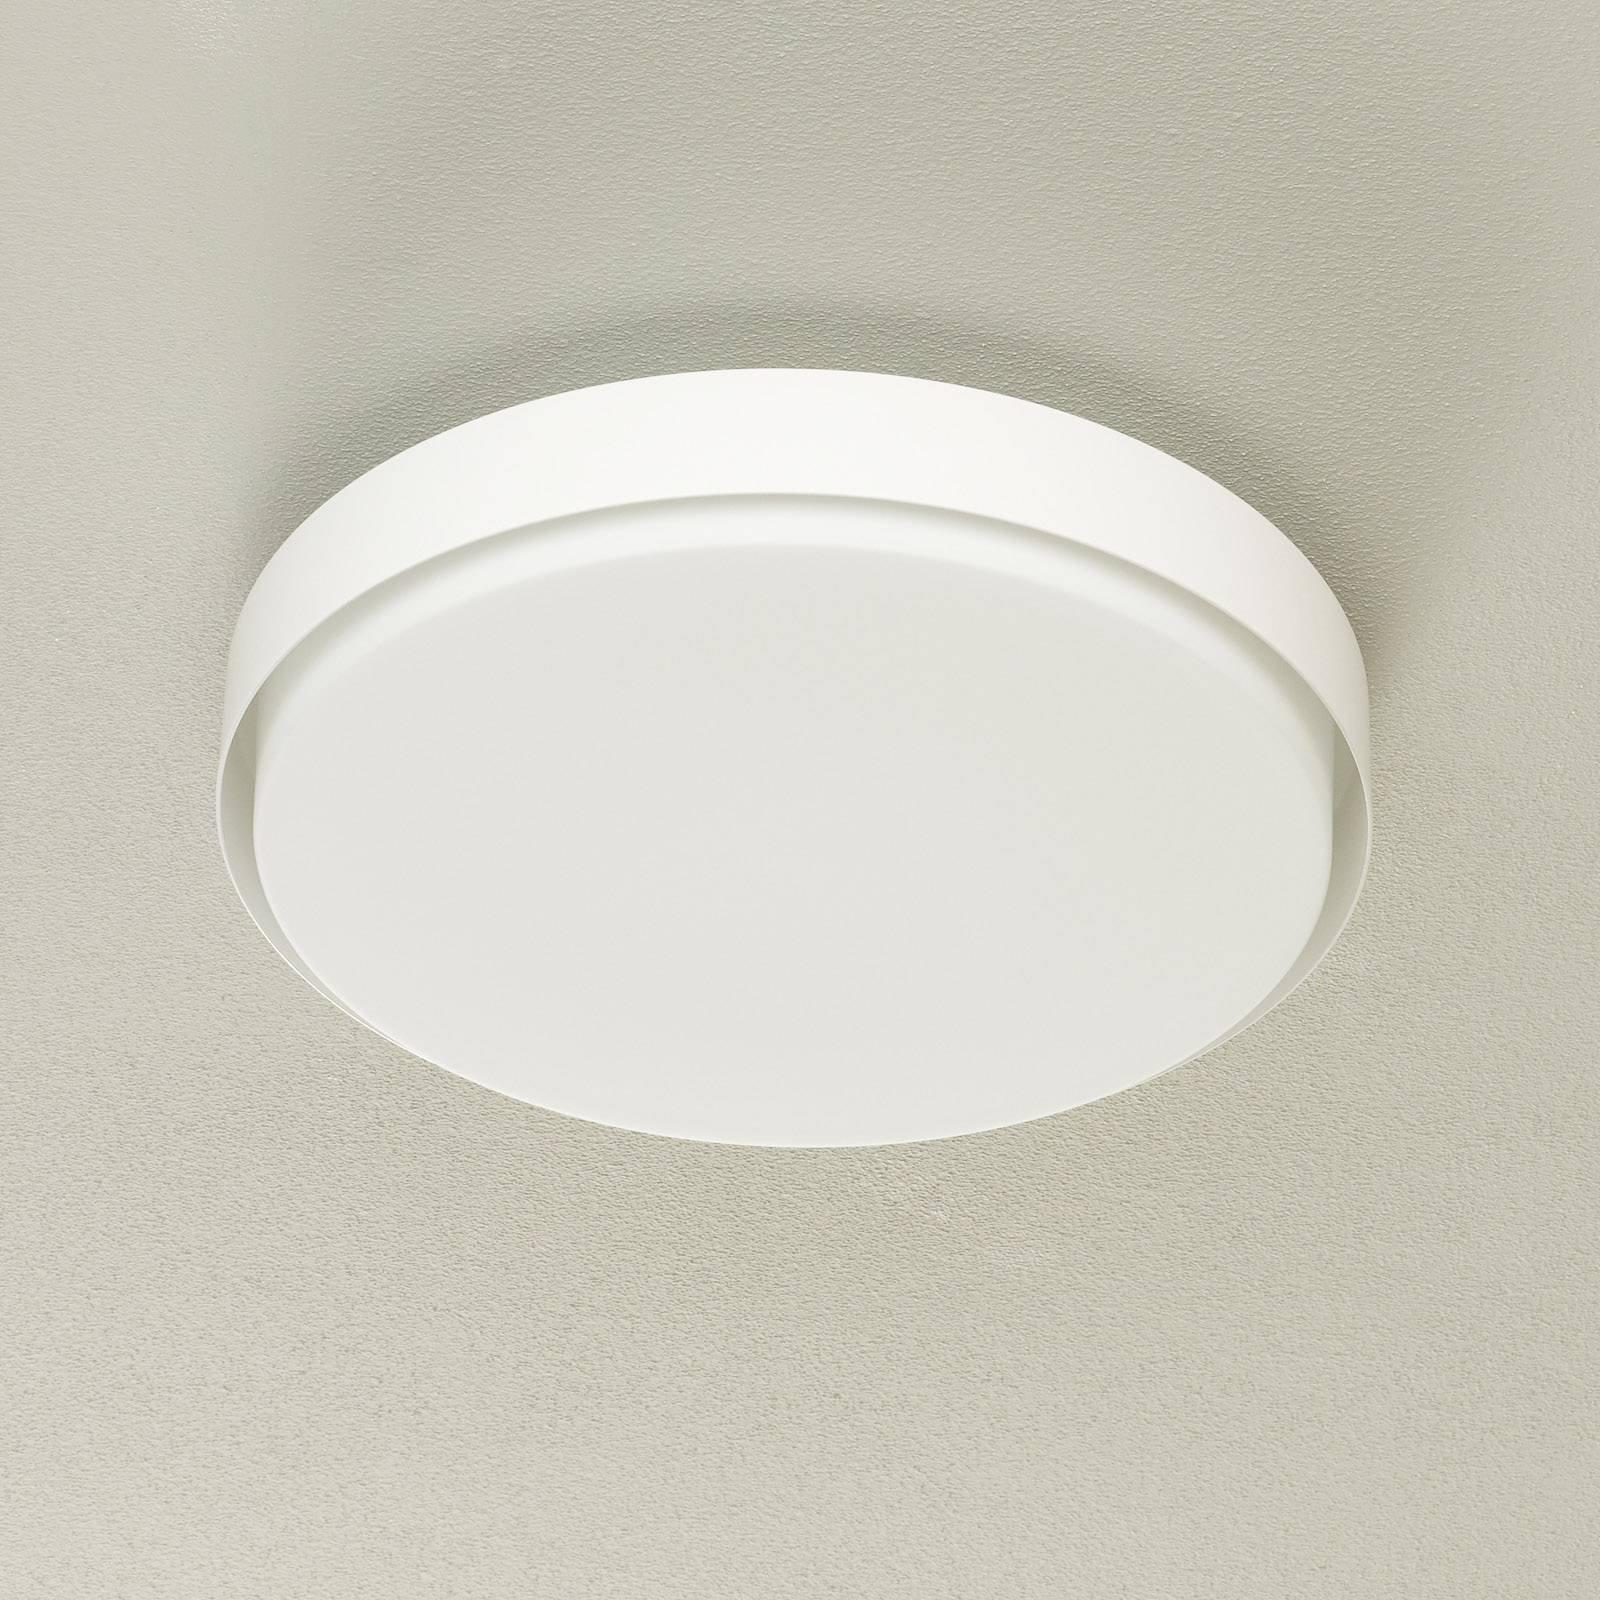 BEGA 34279 LED-taklampe hvit, Ø 42 cm, DALI